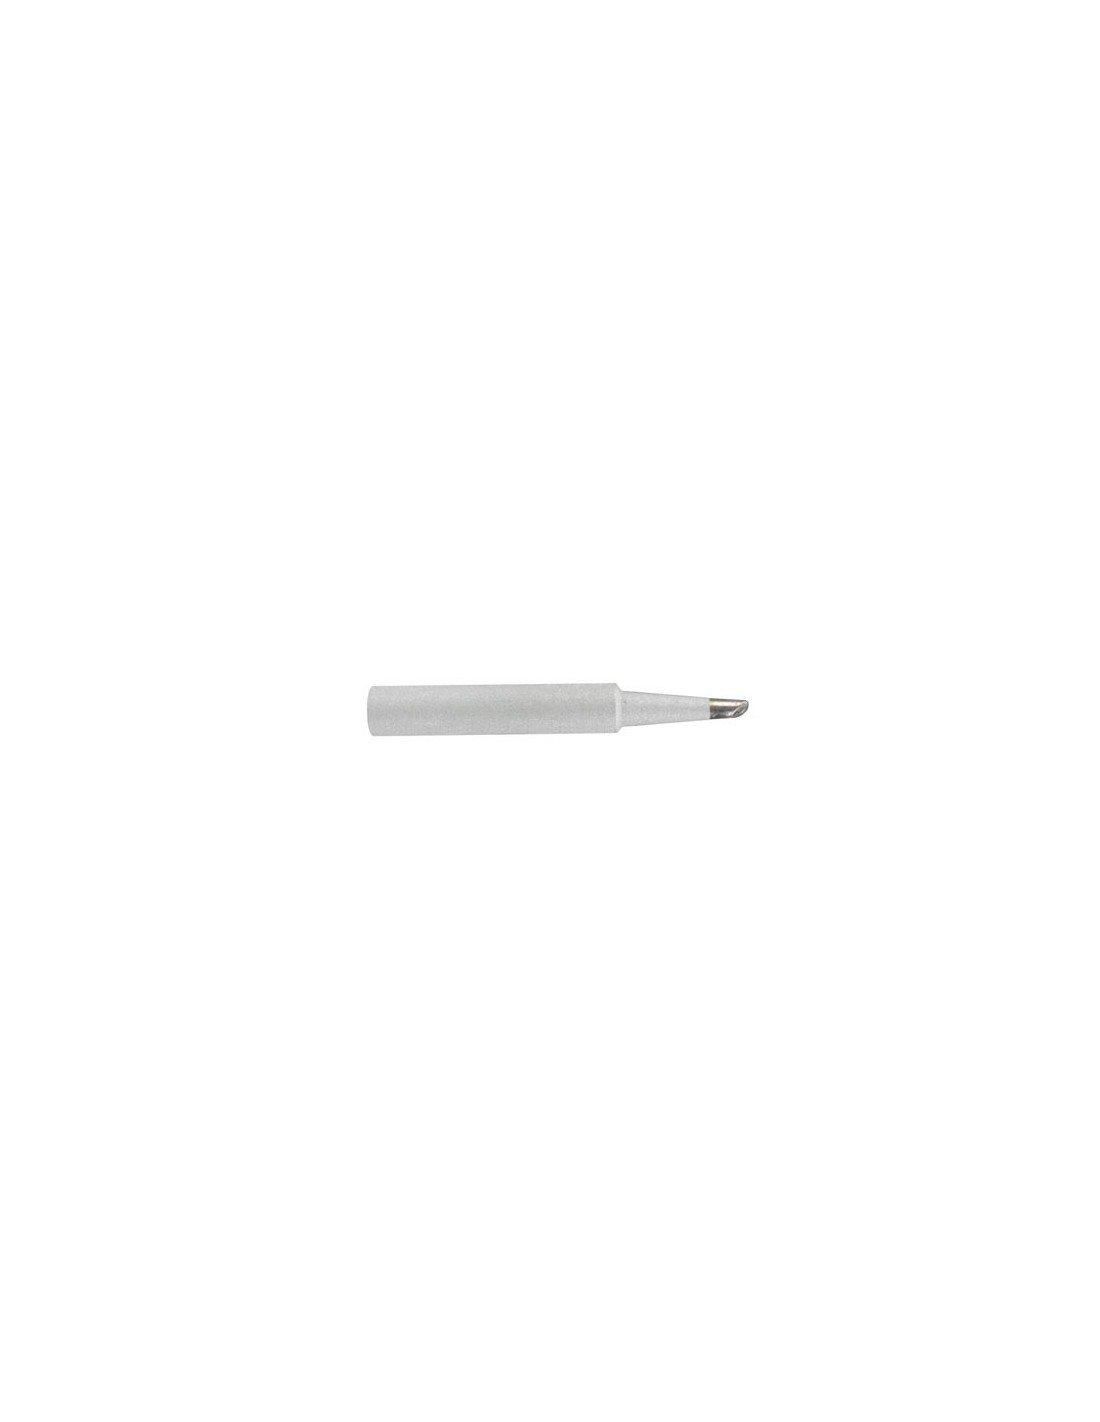 240 V Velleman BITC50N3 Spare Bit with Fine Tip for VTSSC50N Soldering Iron 3 mm Multi-Colour